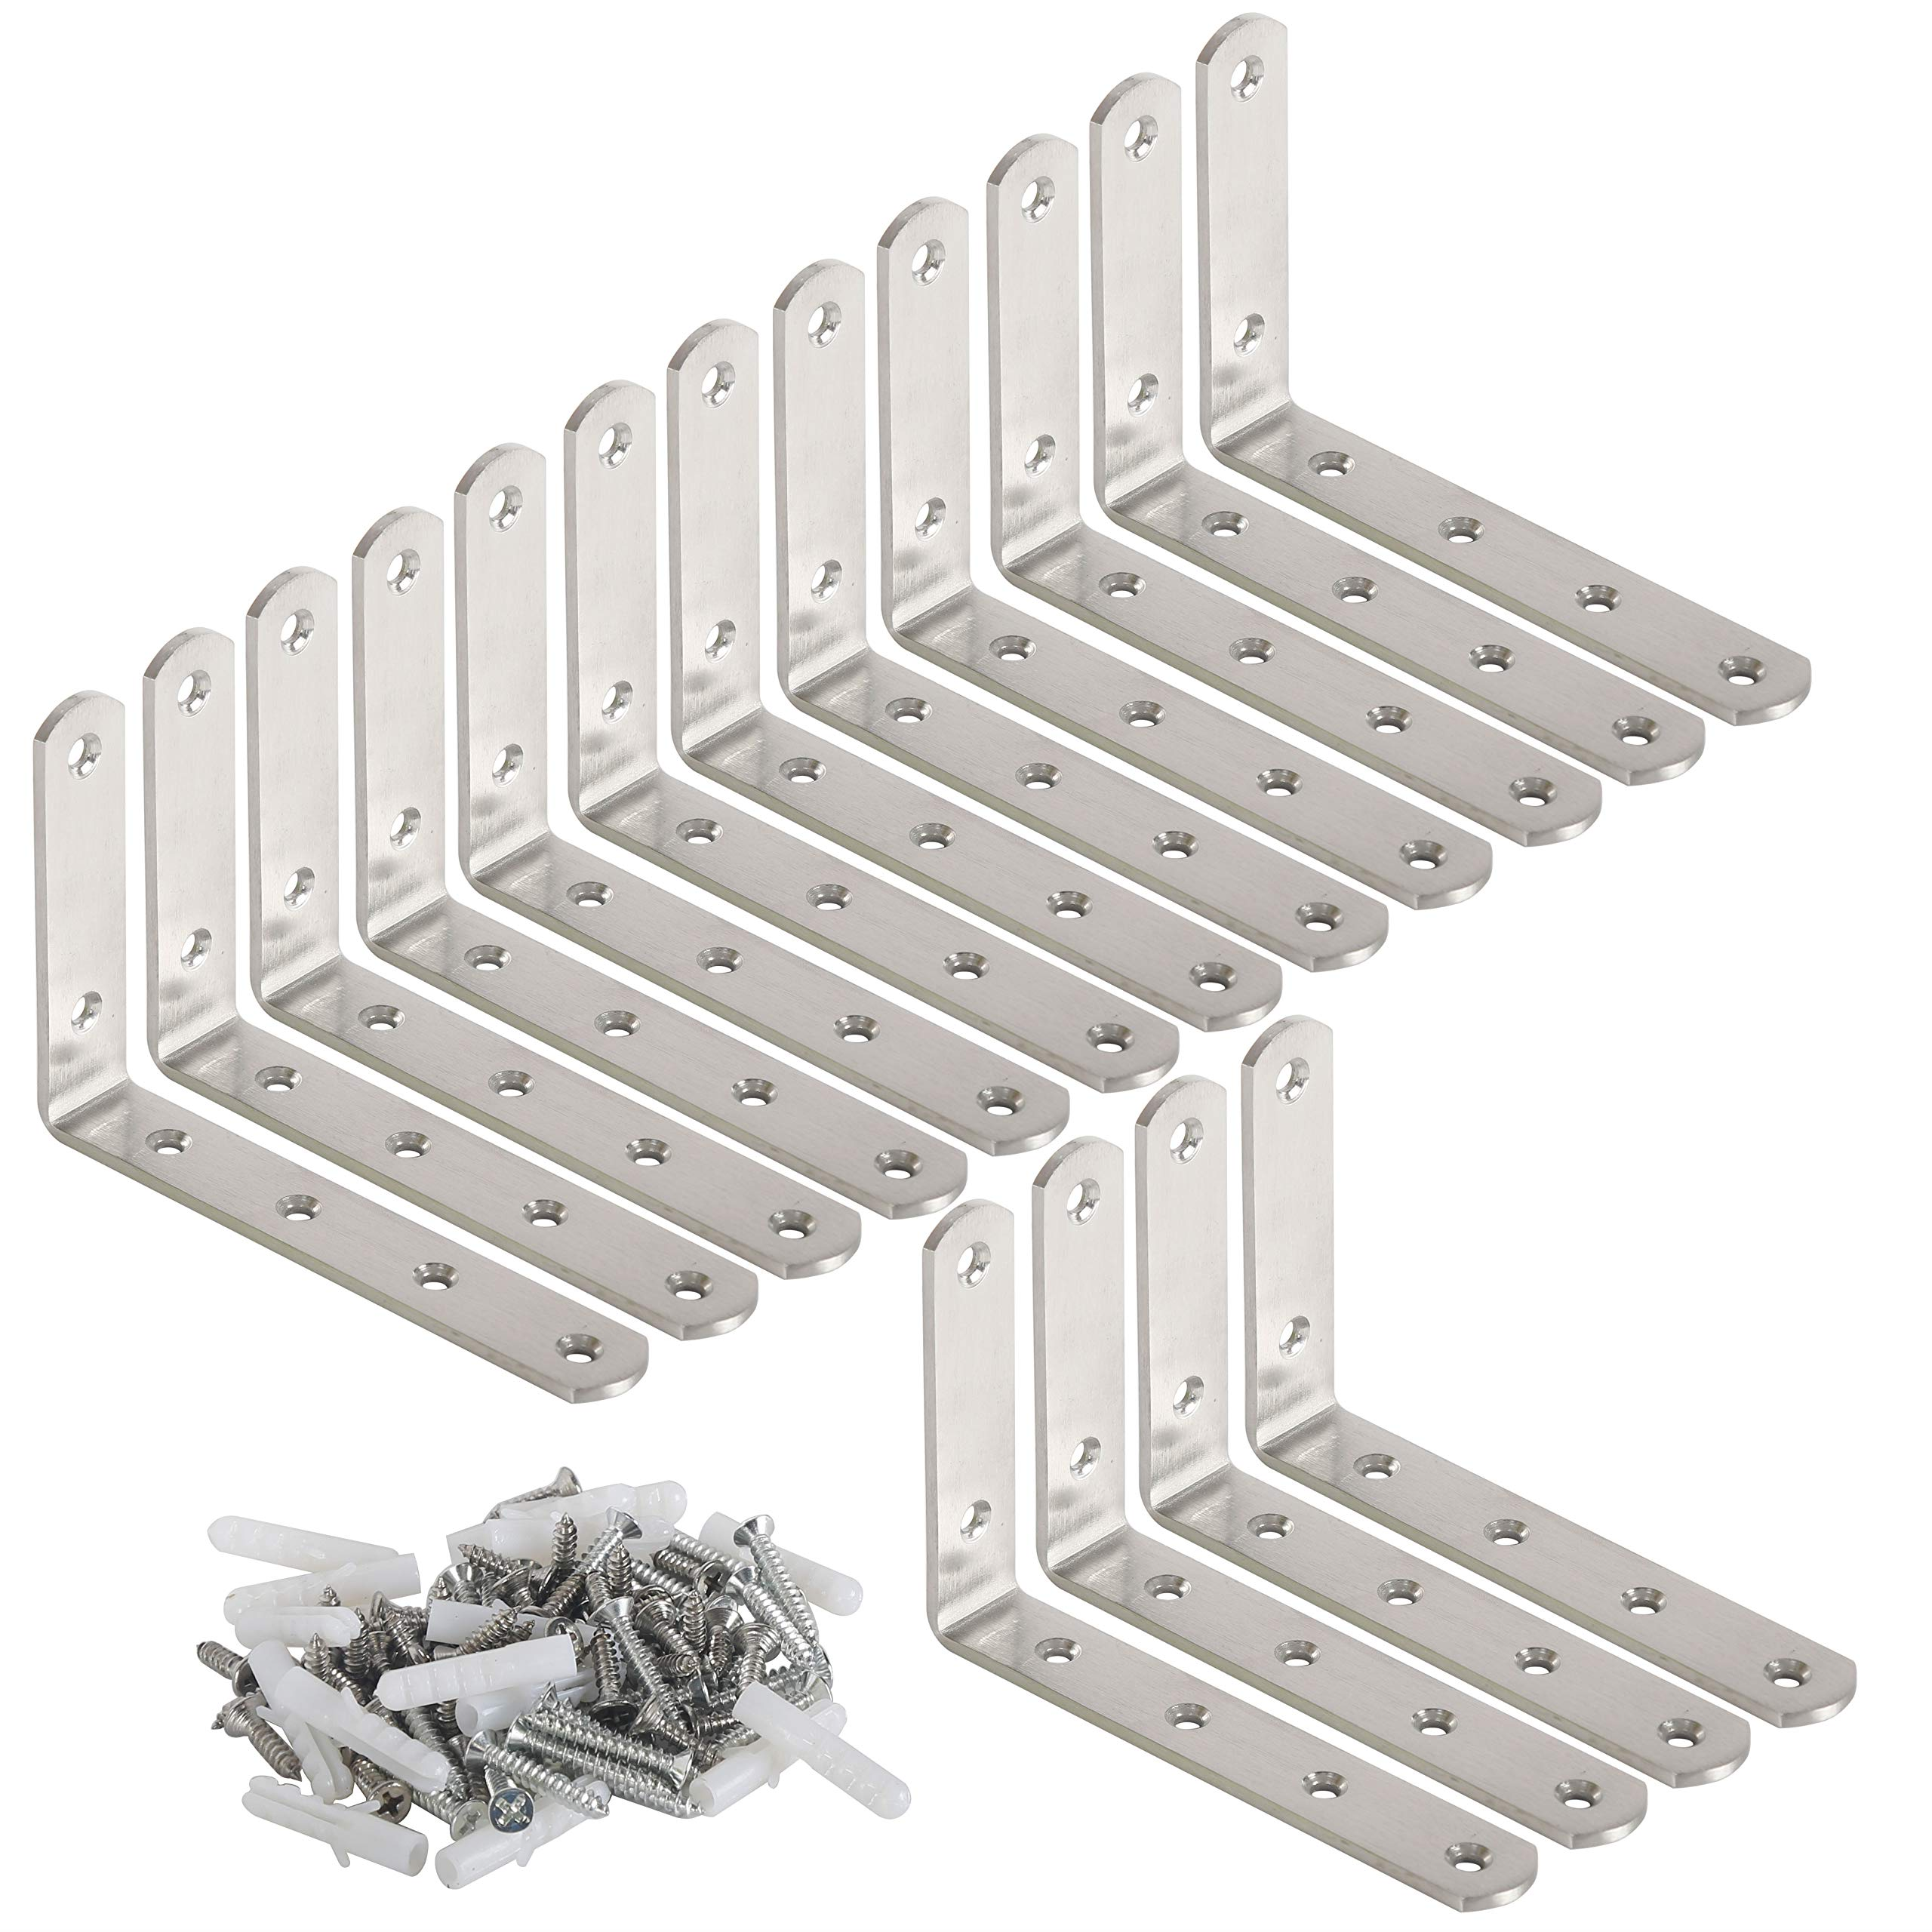 WEBI L Brackets Corner Bracket,90 Degree Steel Corner Brace- 16 Packs, 5'' L X 3'' W,Heavy Duty- Shelf Brackets Right Angle Bracket for Shelf, Wood, Furniture, Shelves, Brush Nickel,Screws Include